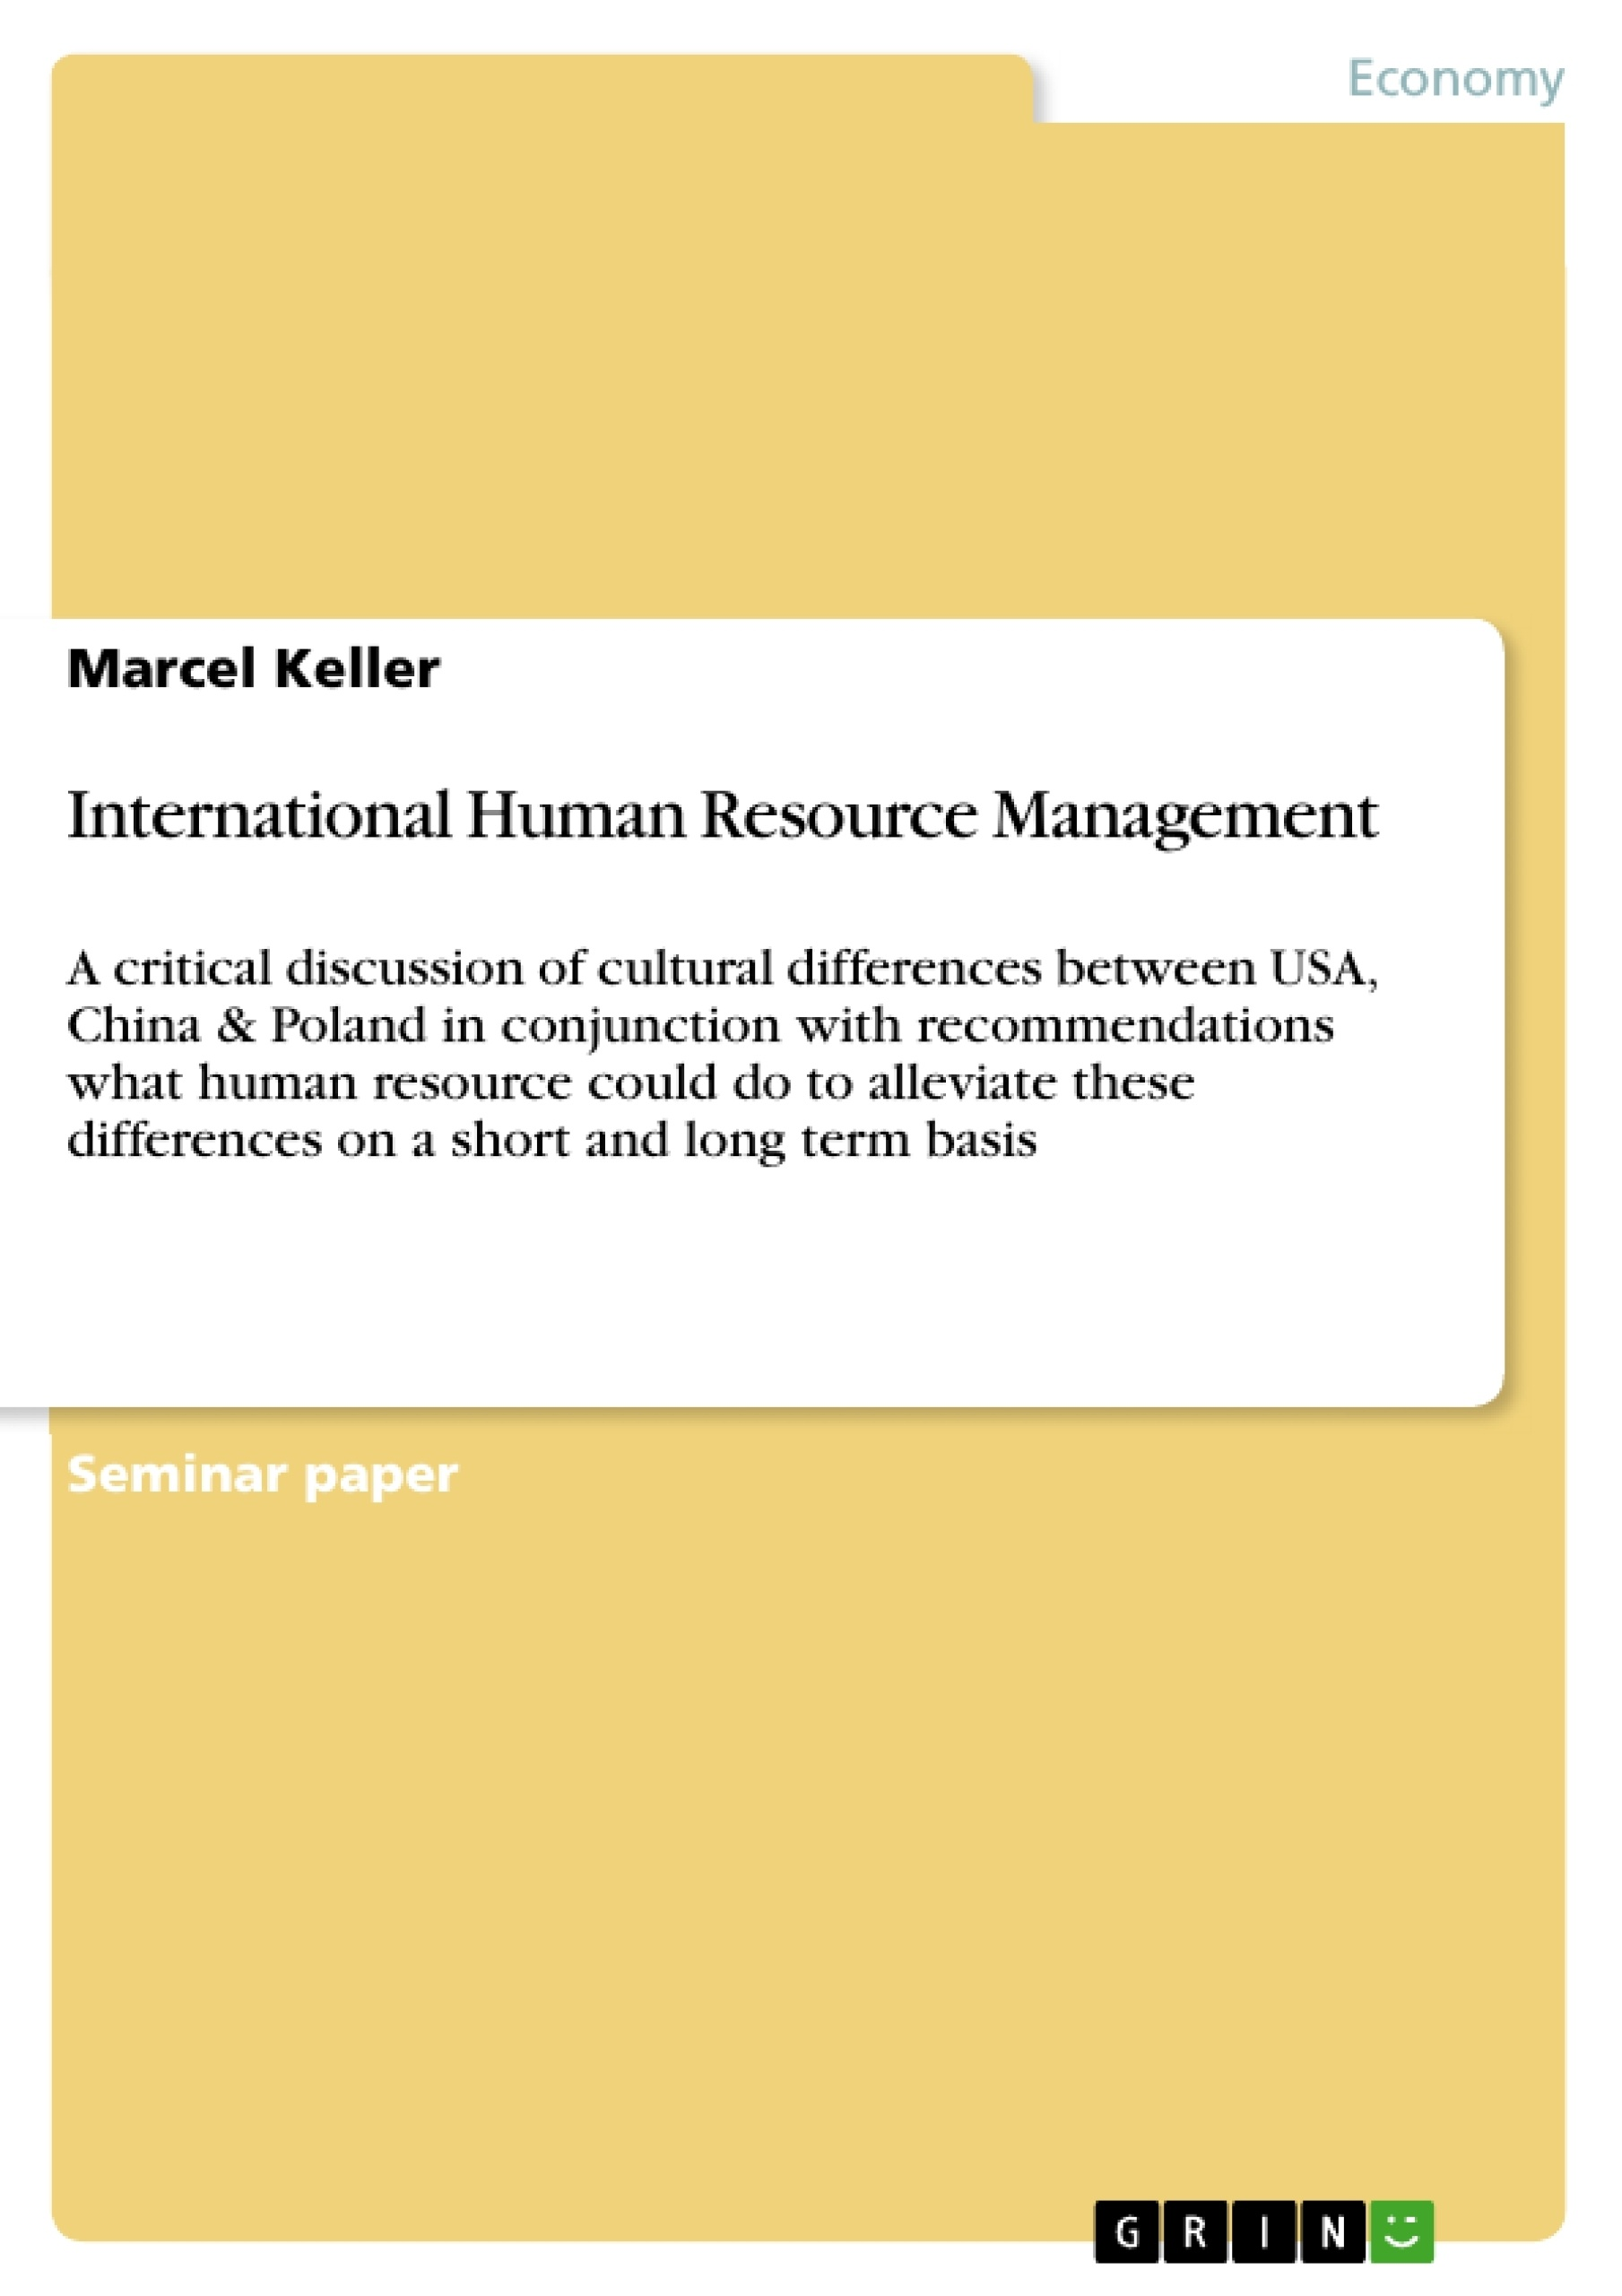 Title: International Human Resource Management